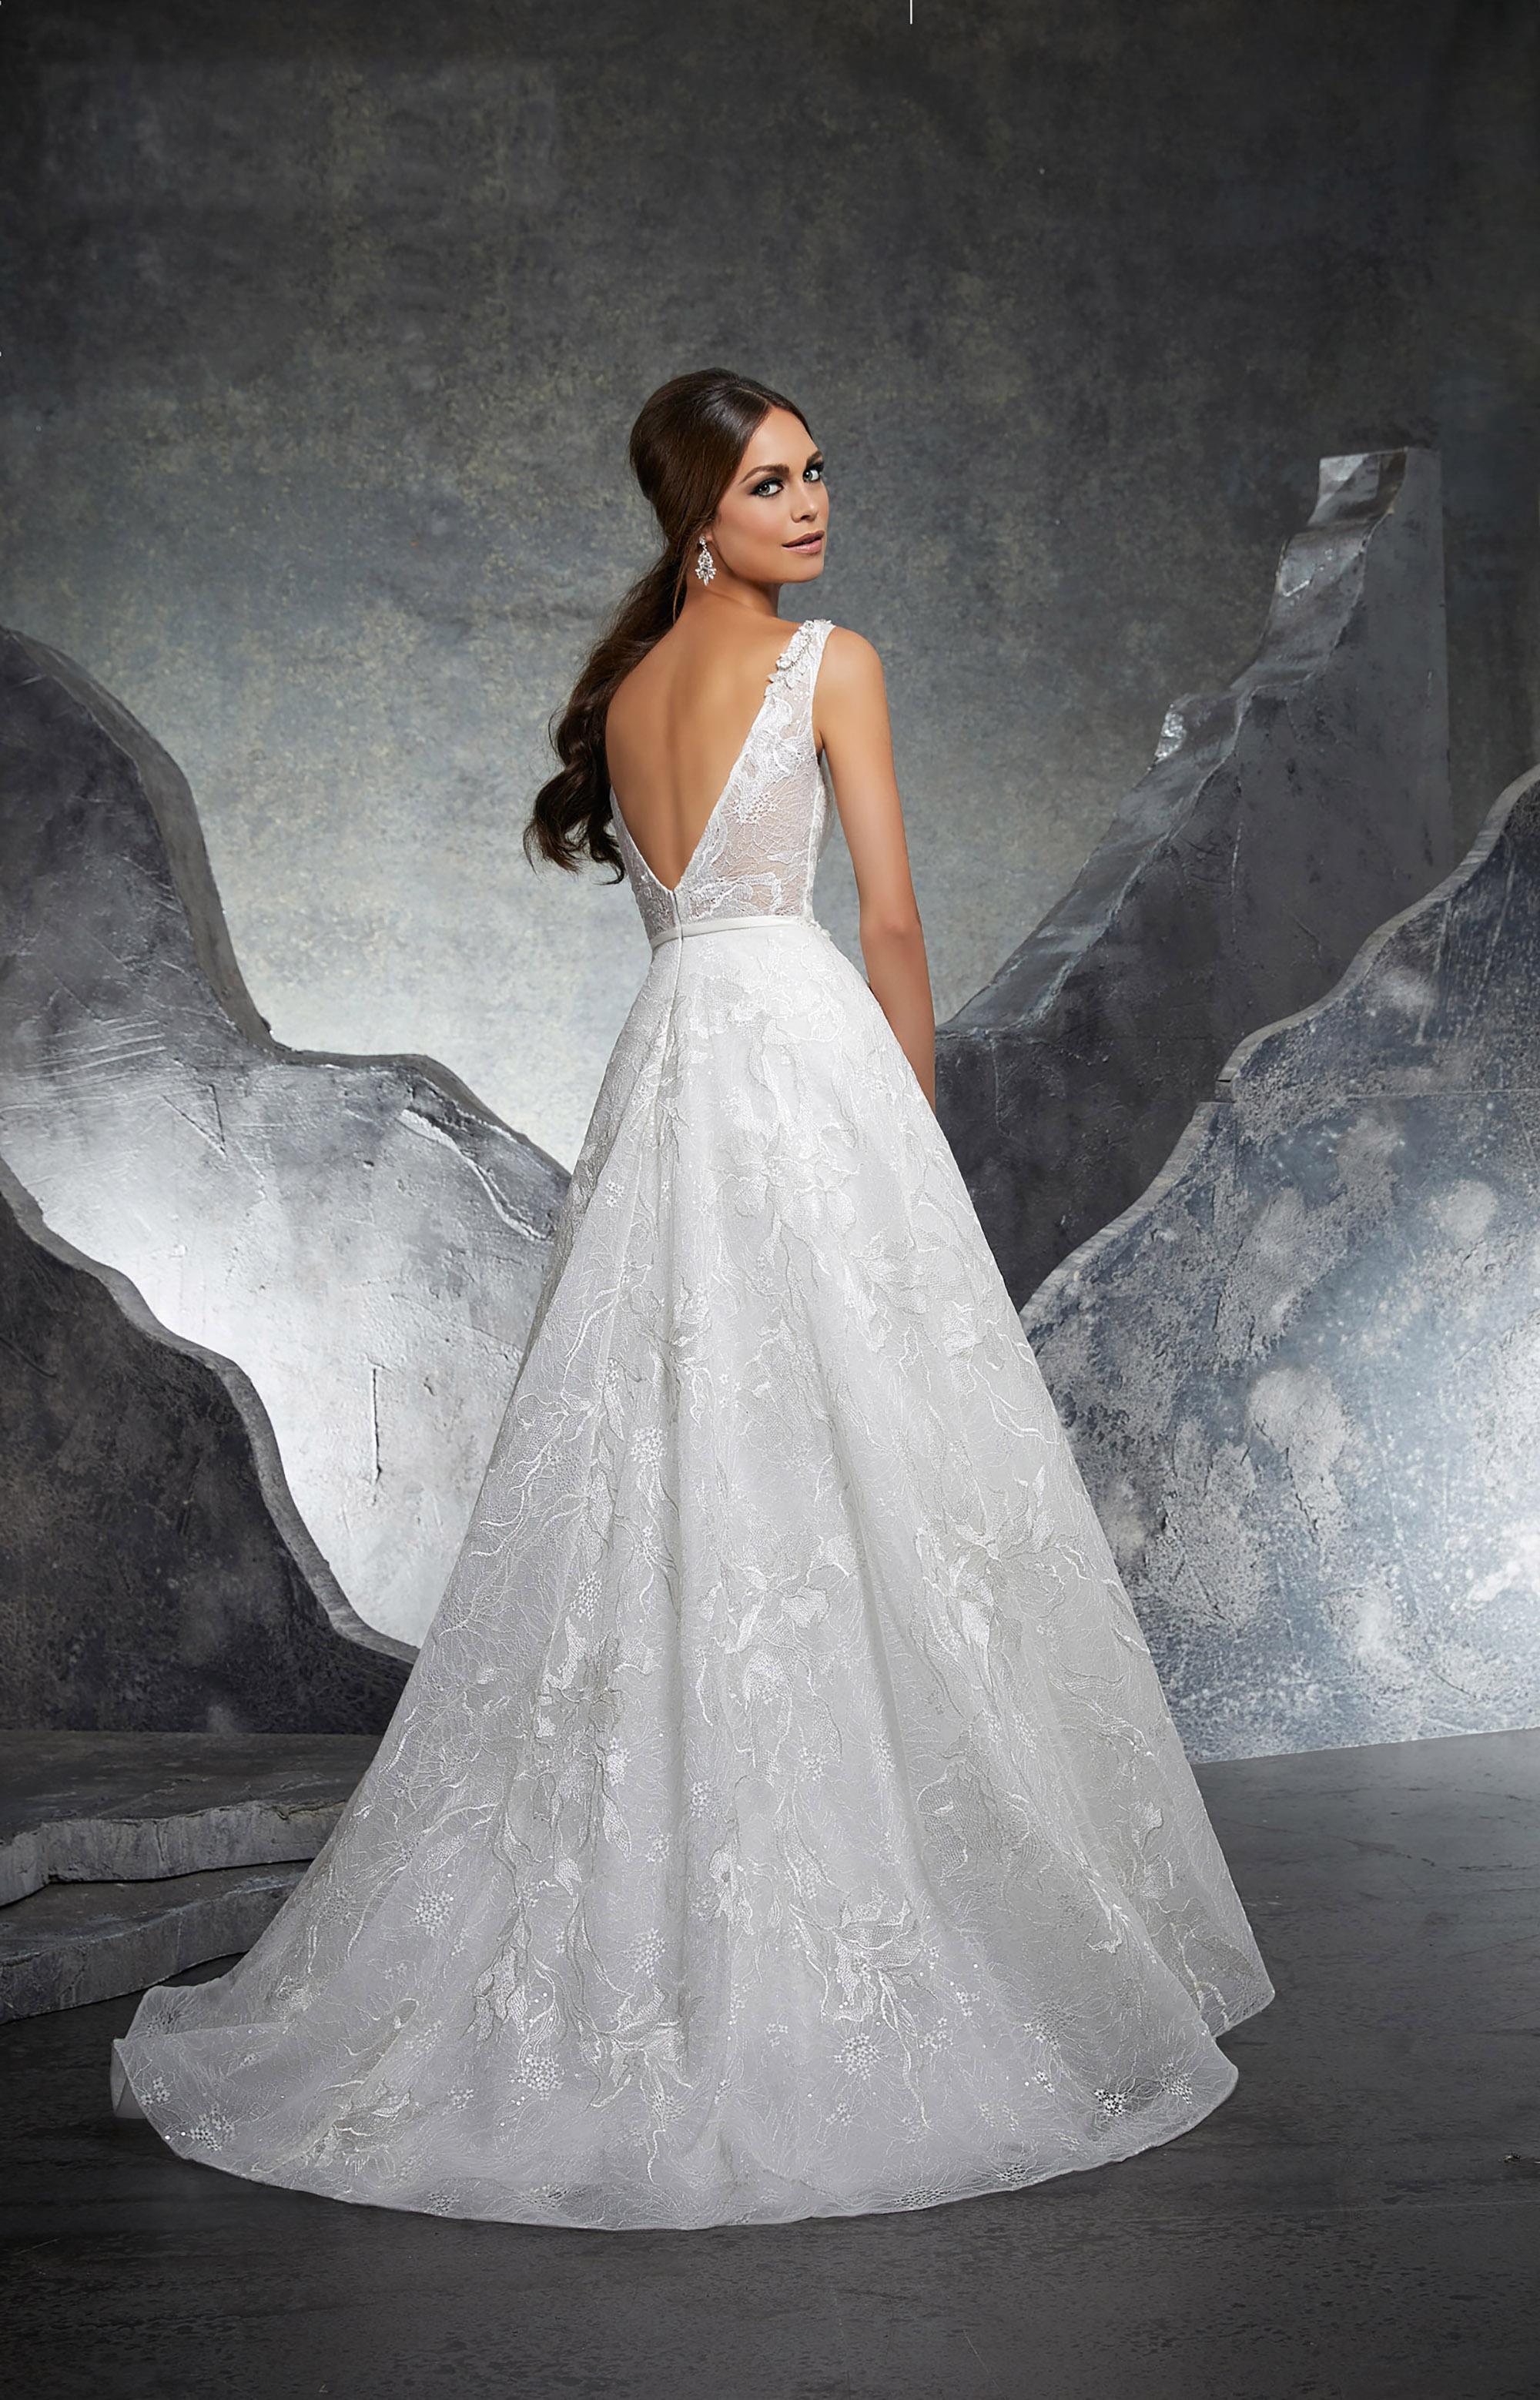 Vestido Lucía Fiesta 2019 mod. 5614 - 3